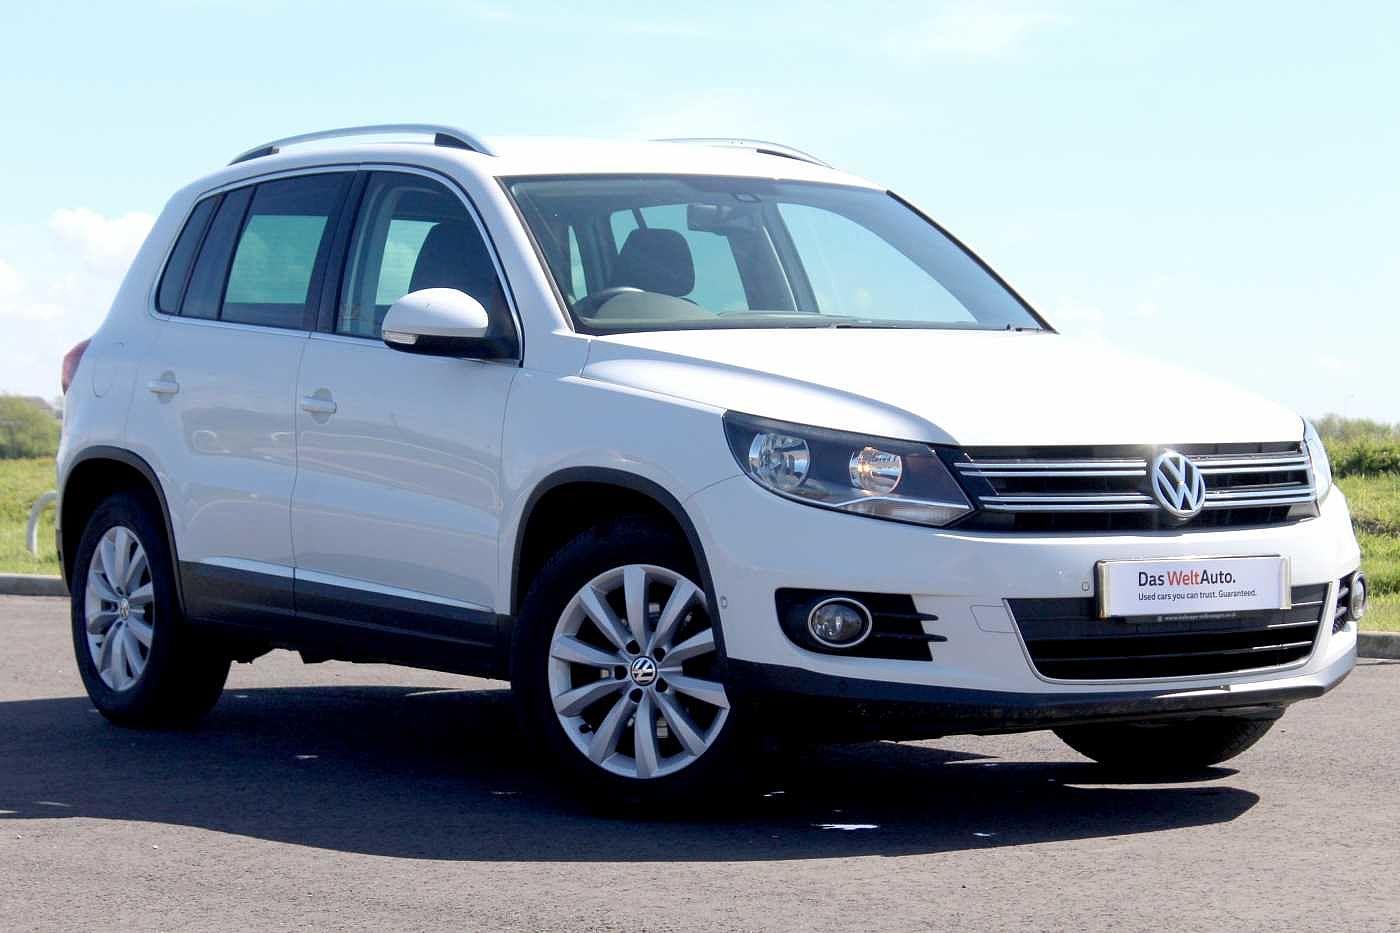 Volkswagen Tiguan 2.0 TDI 140PS 2WD Match 5Dr